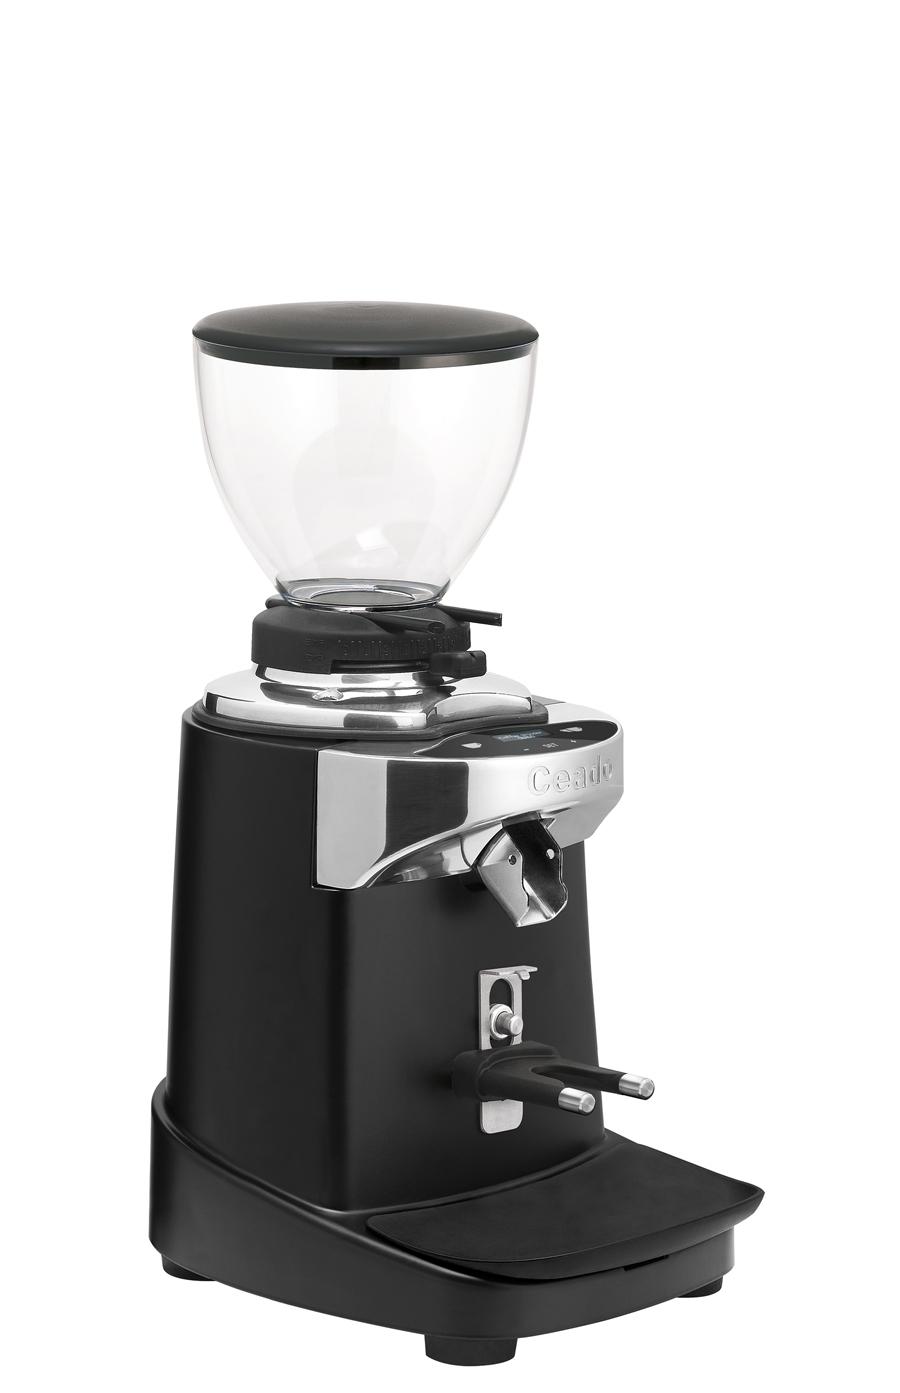 Ceado E37J Schwarz Matt Kaffeemühle